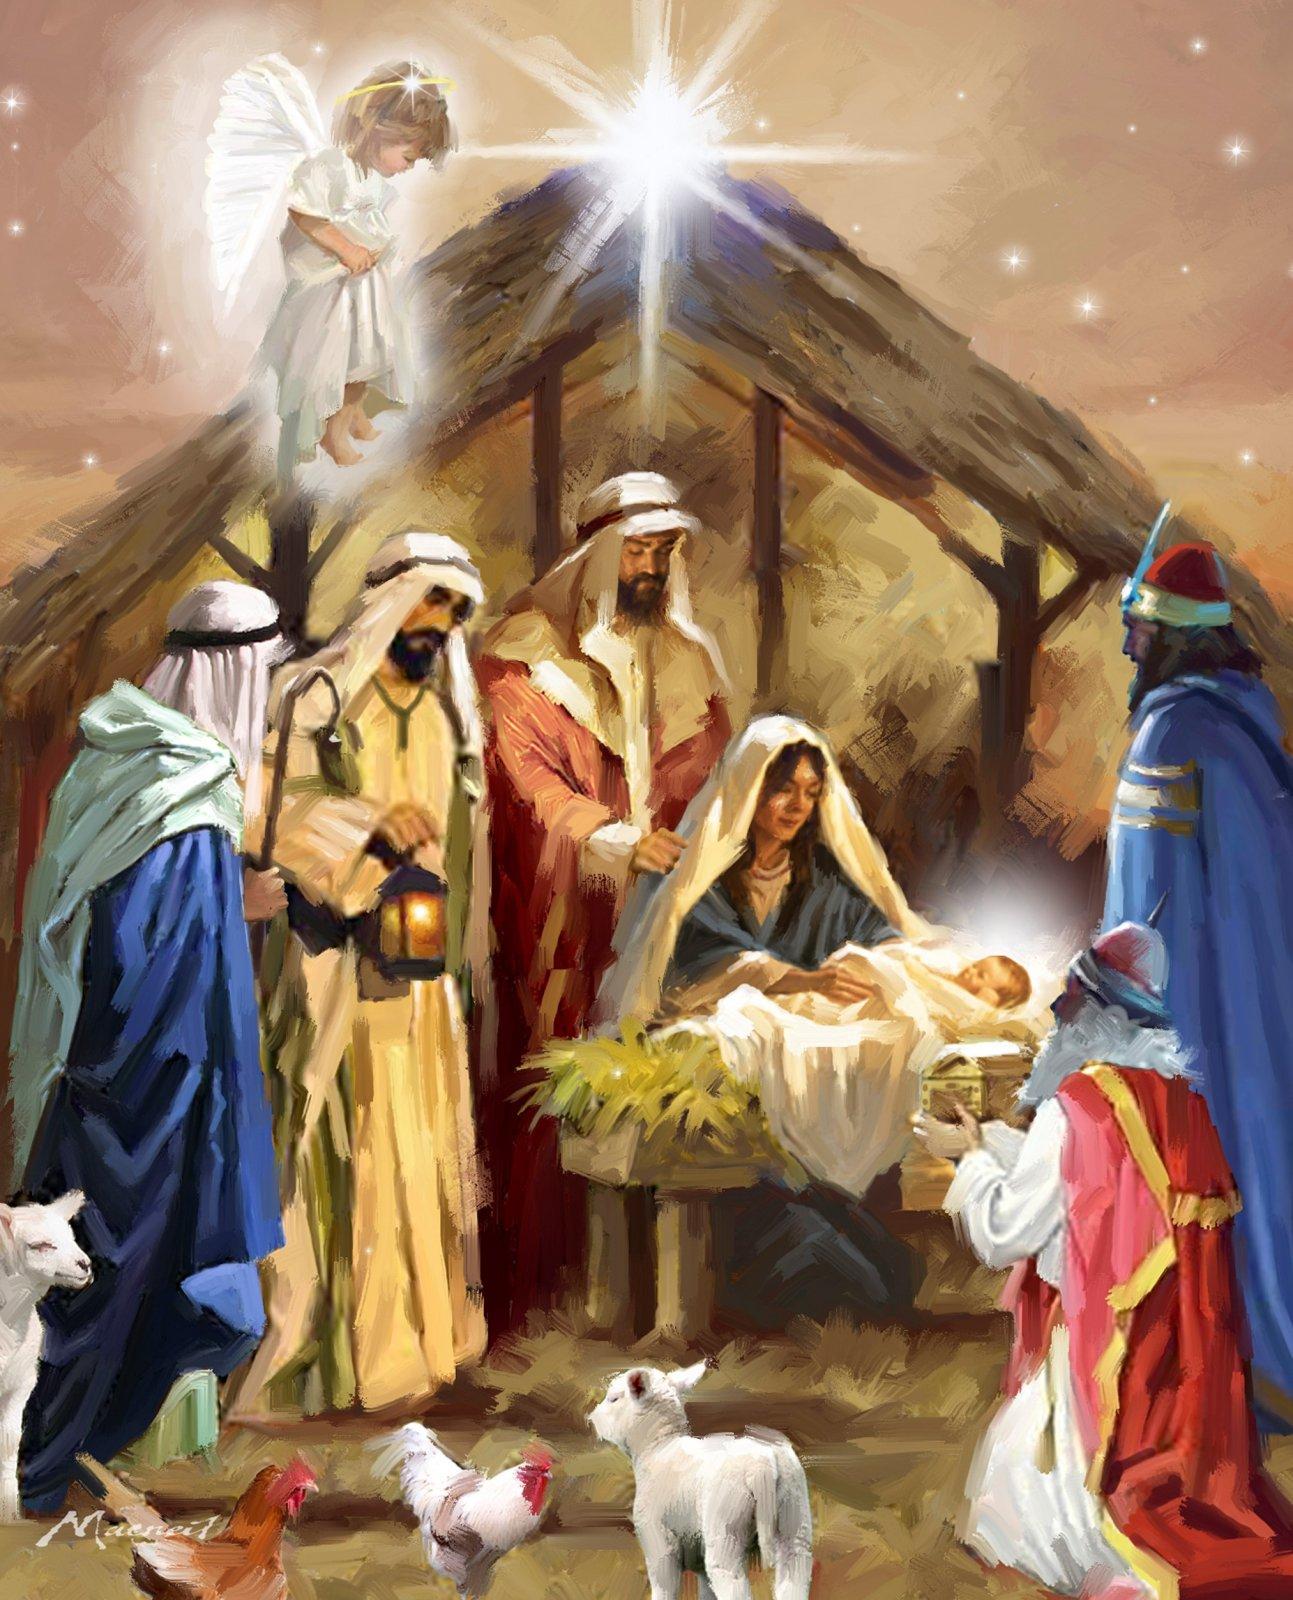 DT-Exclusives AL-3792-9C-1 Religious Collage Panel